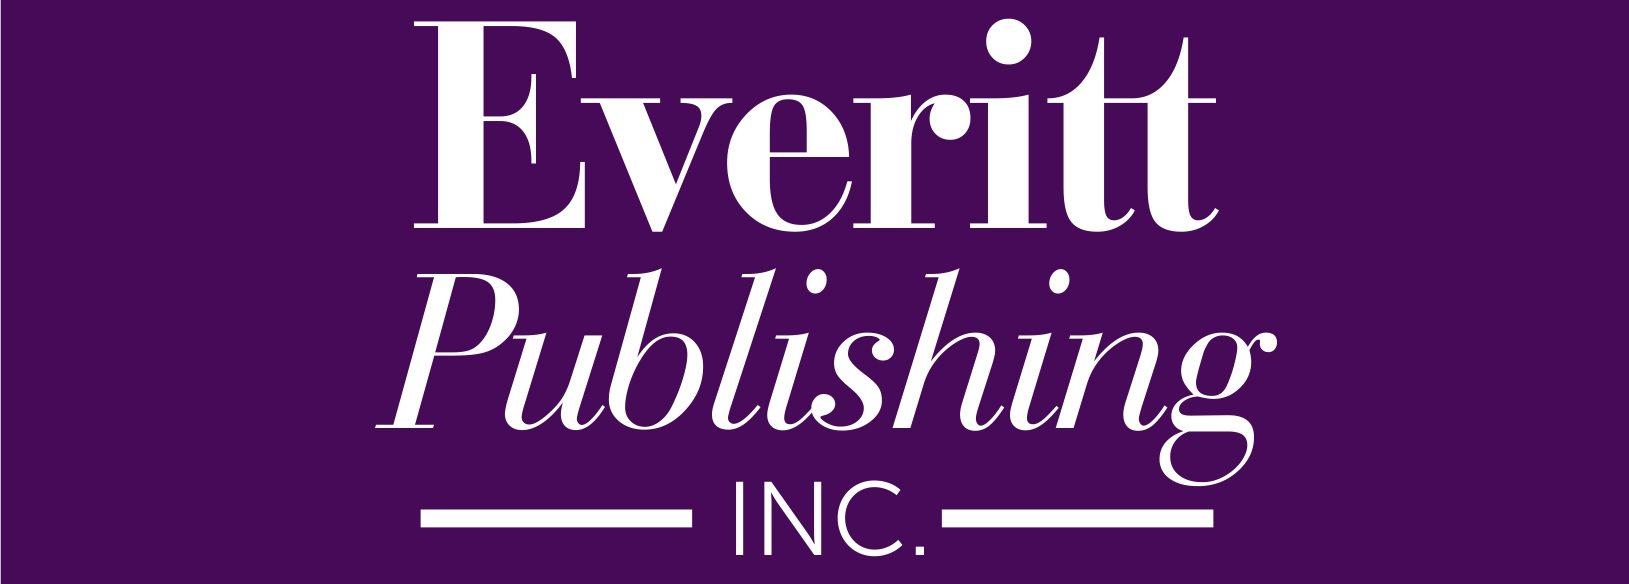 Everitt Publishing Inc